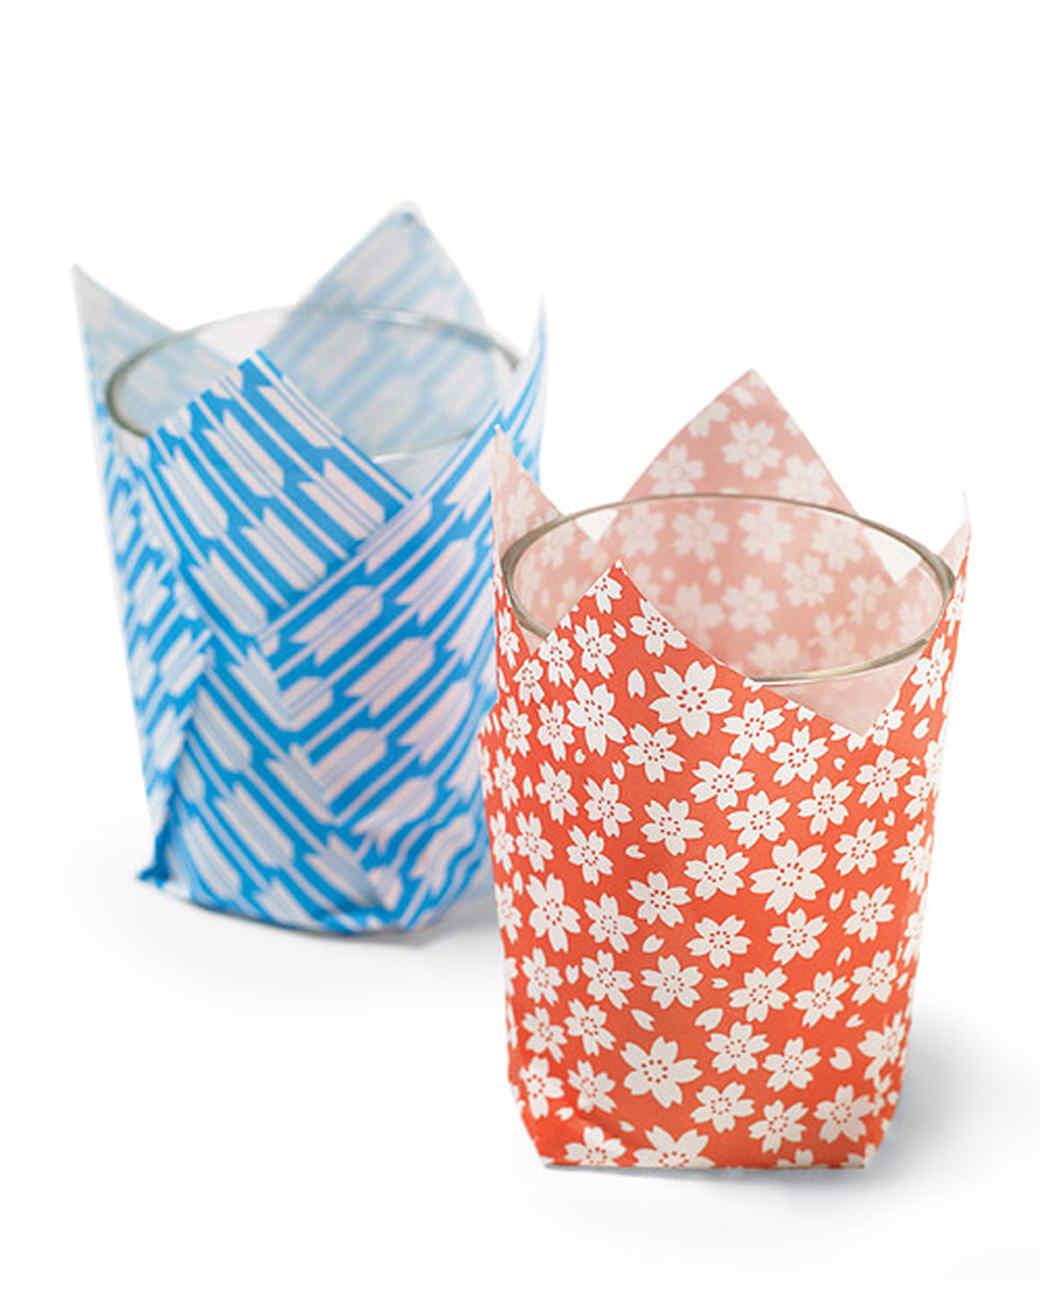 mld104812_0709_origami2.jpg